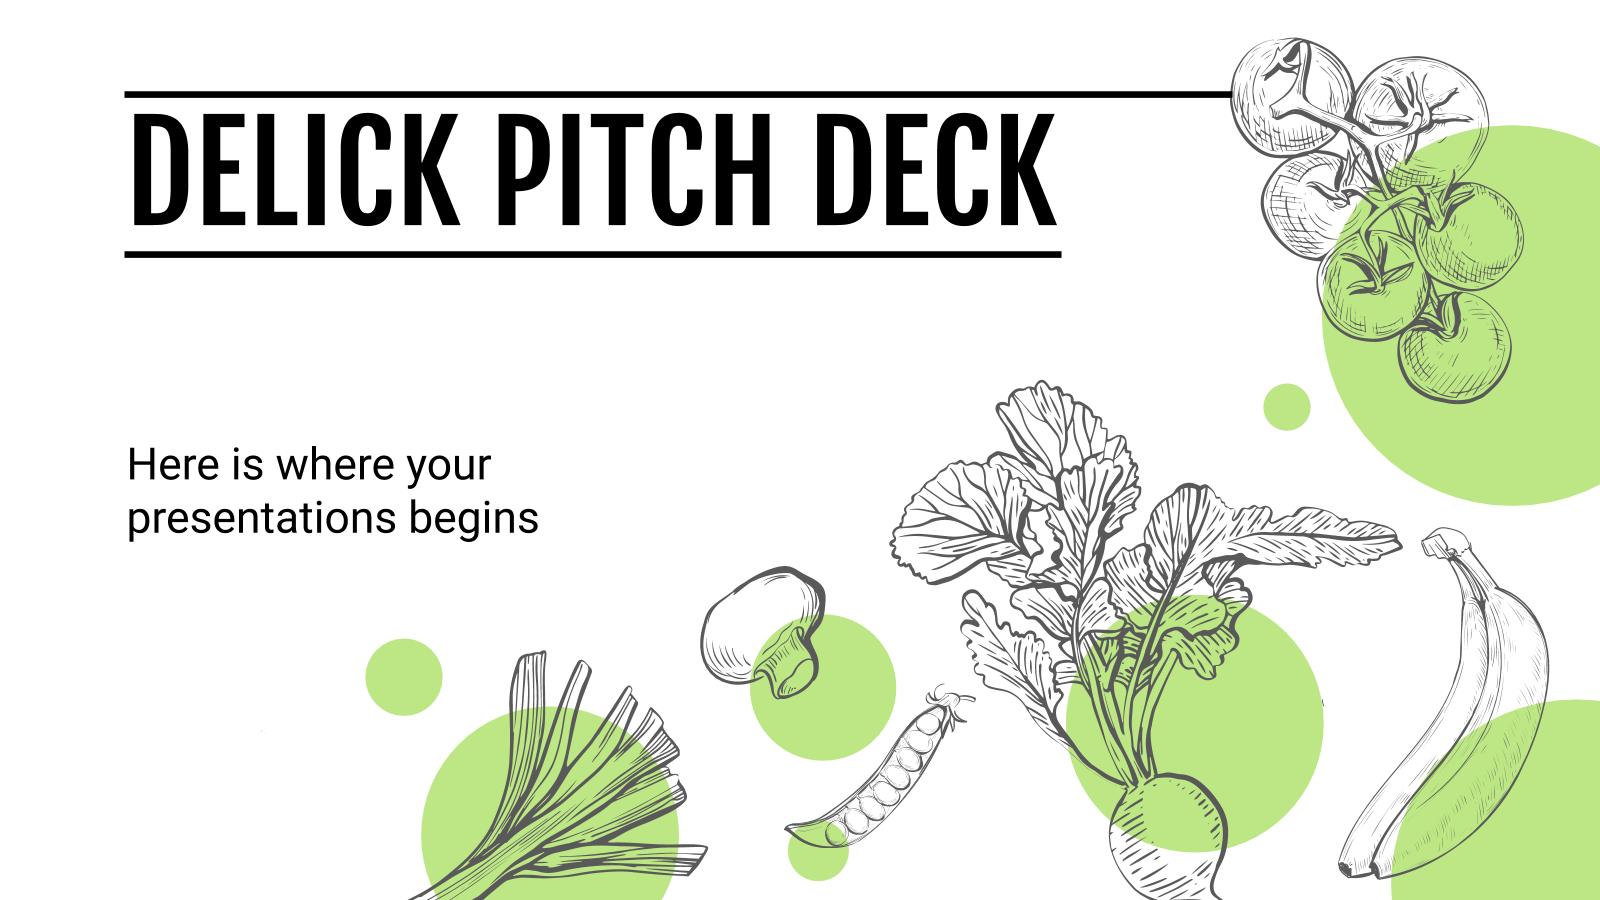 Delick Pitch Deck presentation template